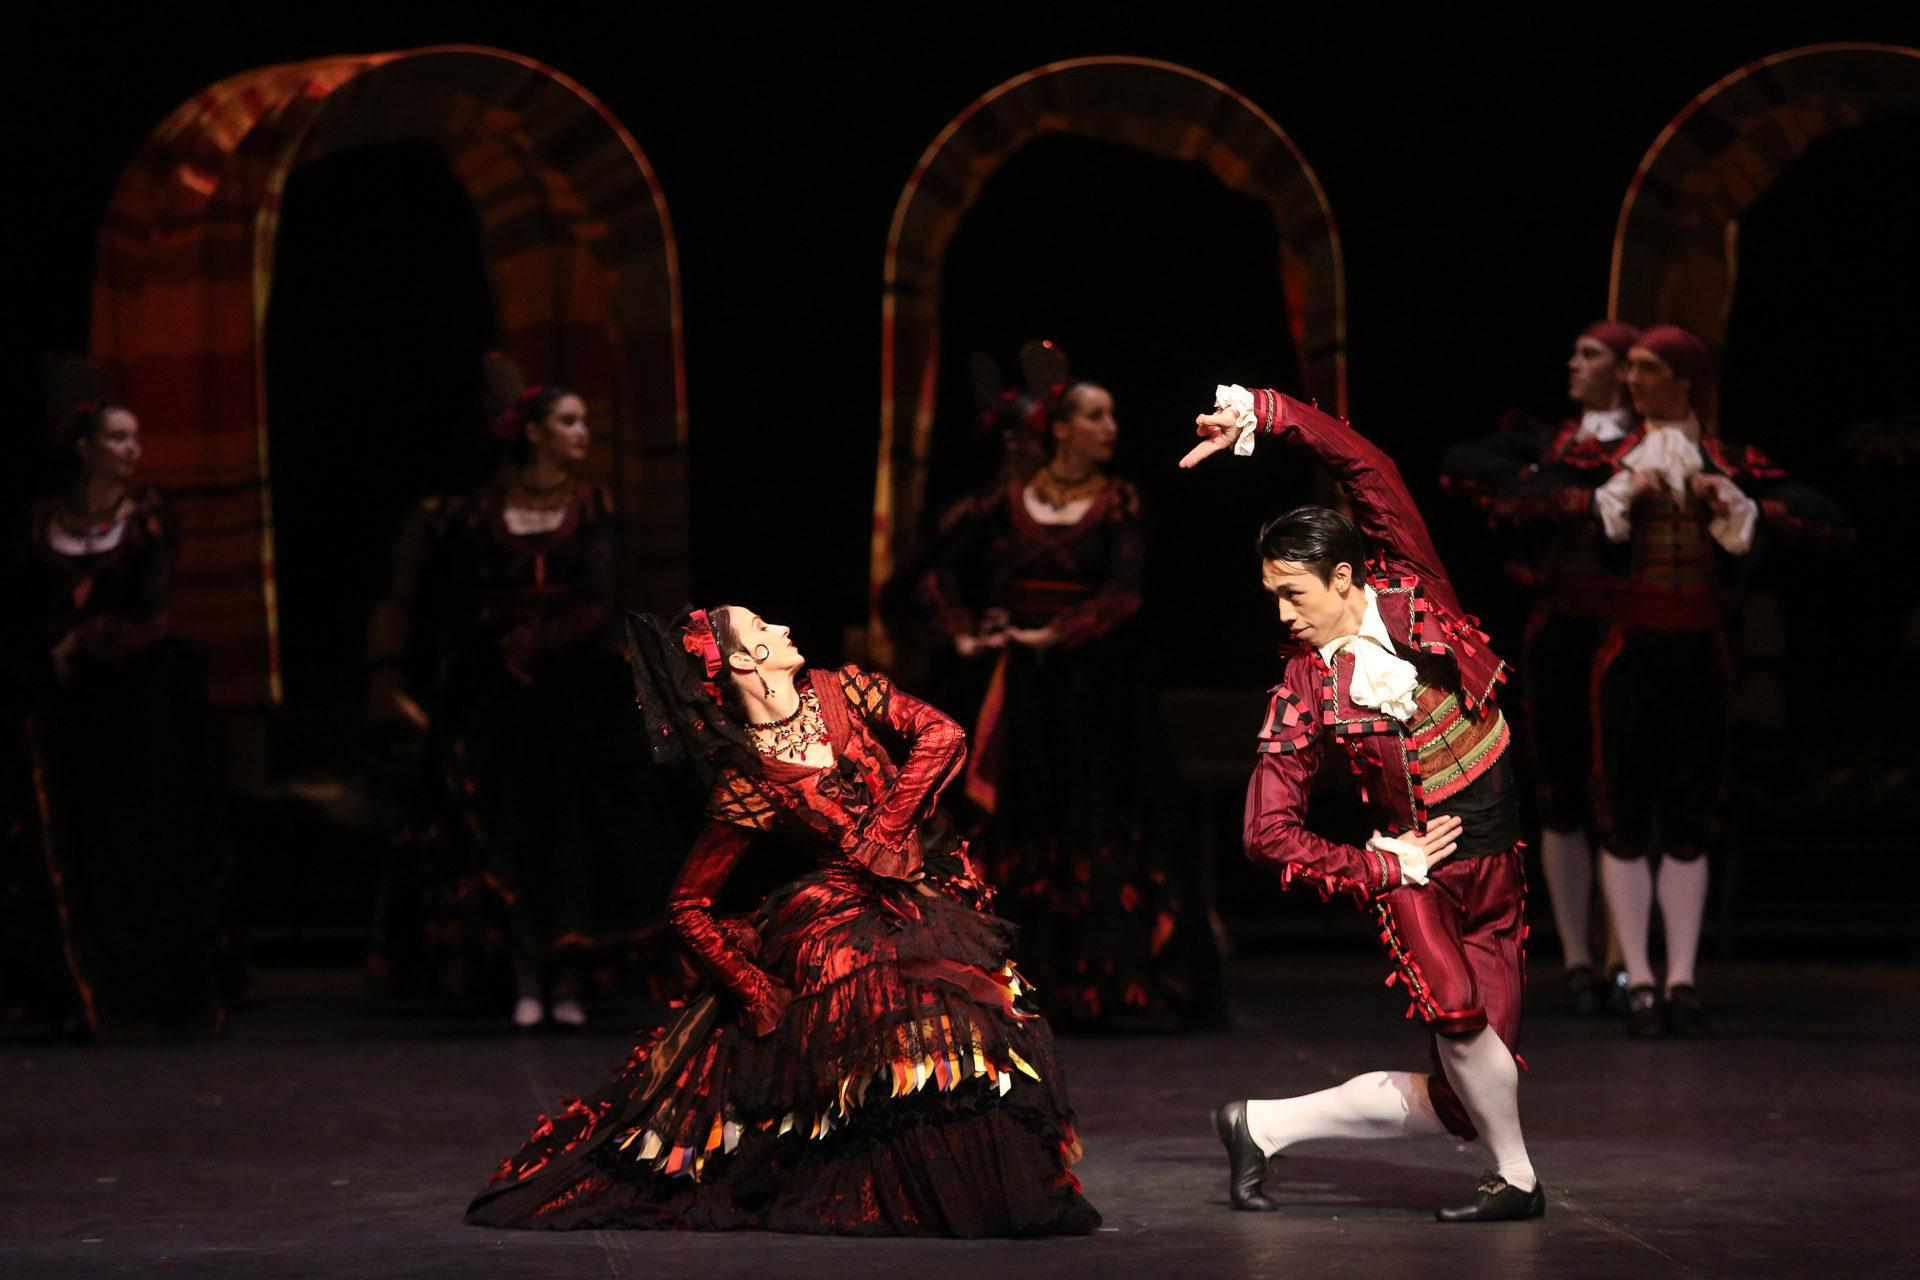 Don_Quixote_HH_Ballett_Foto_AnjaBeutler.de_630